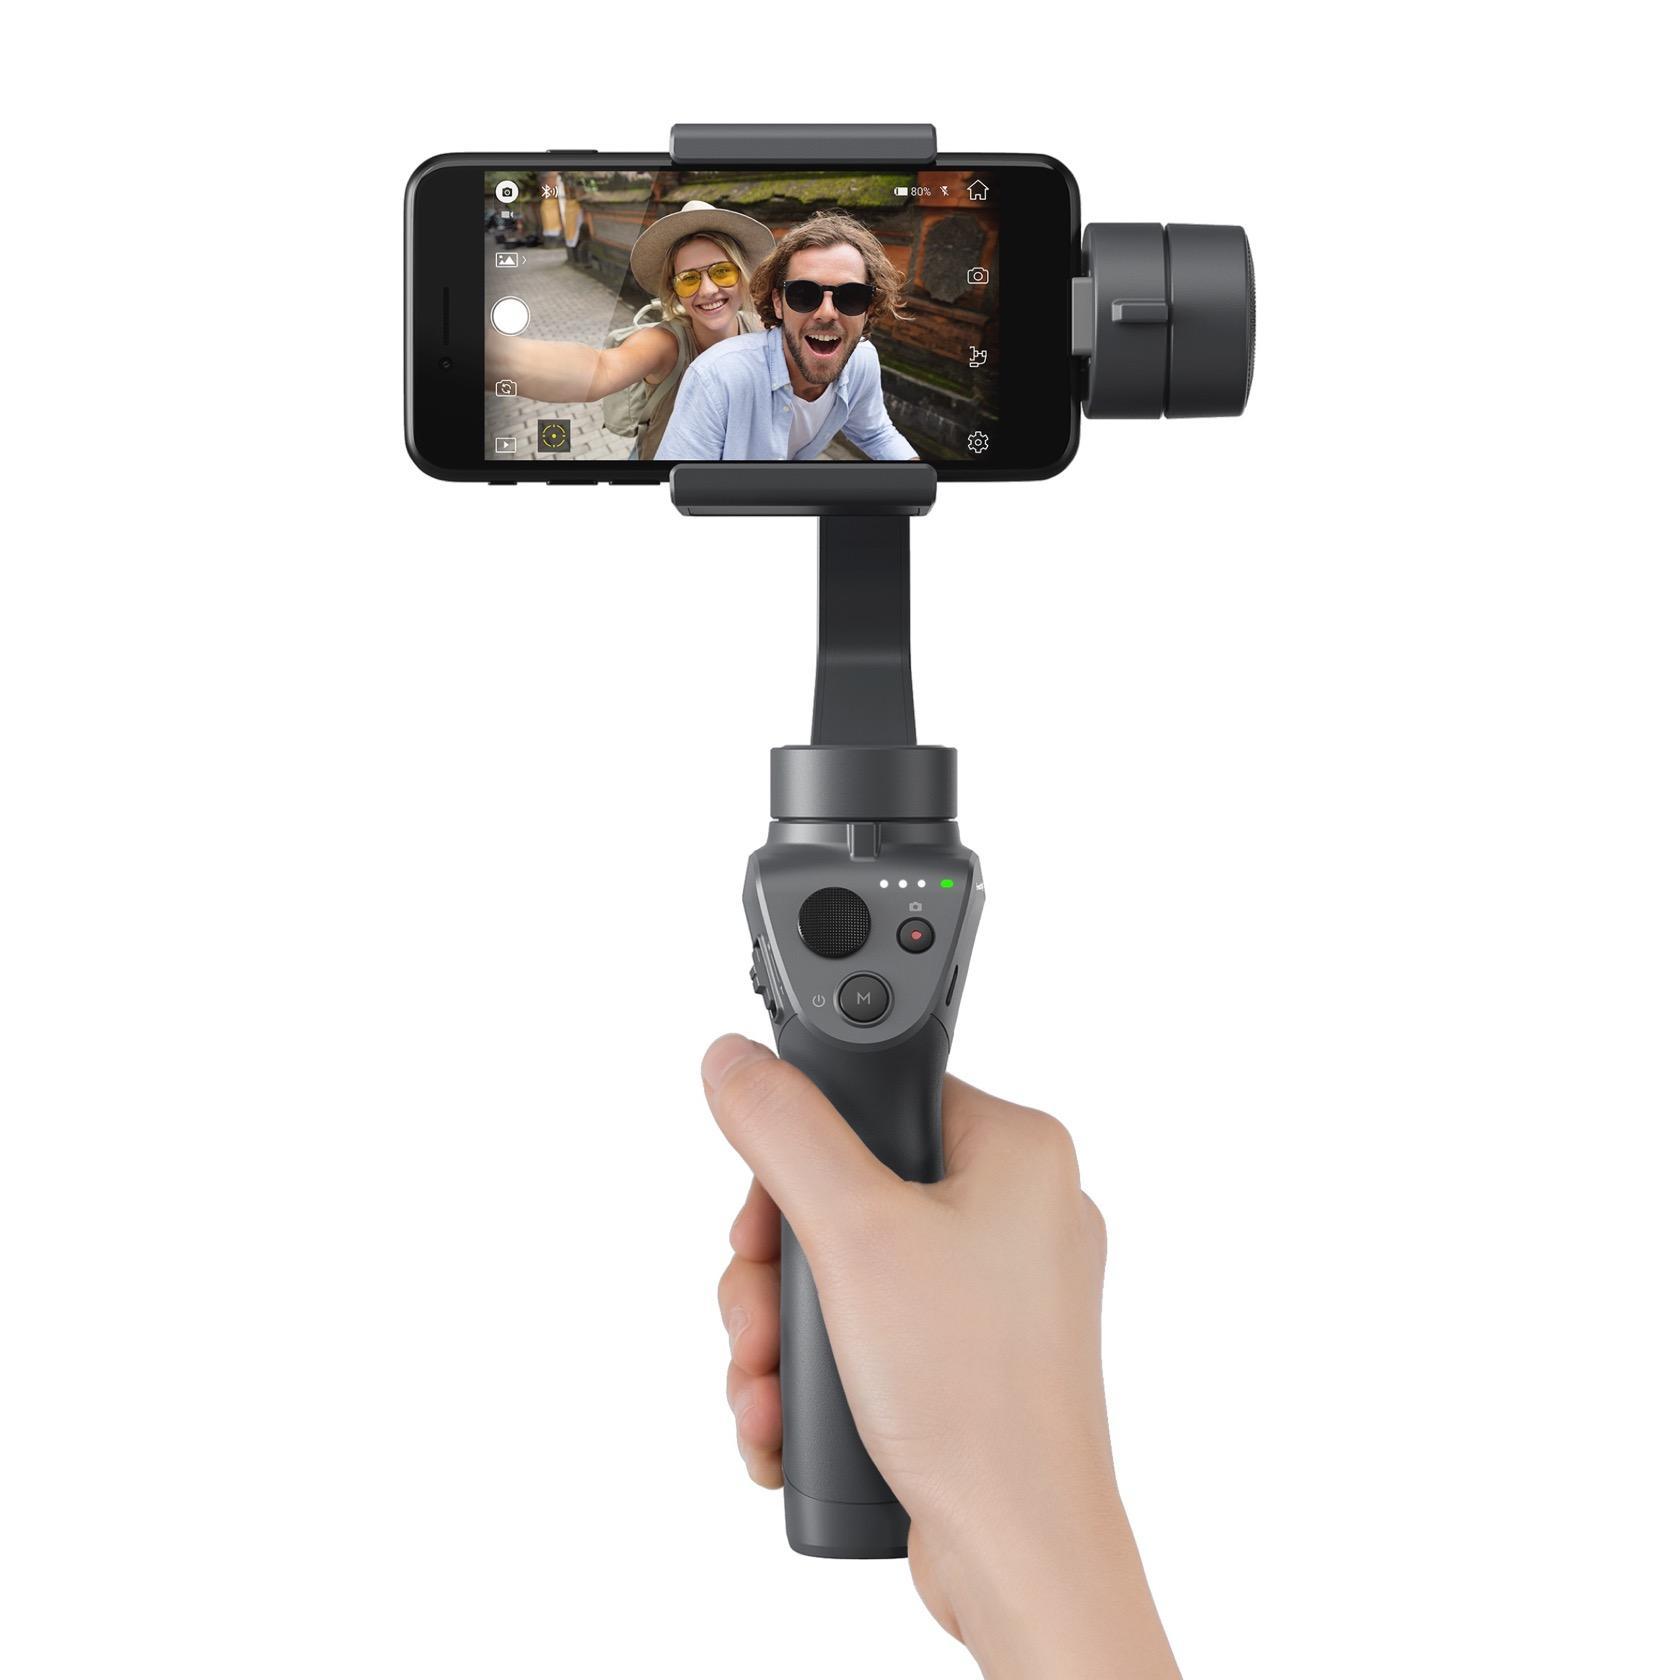 DJI Osmo Mobile 2 packs phone stabilization for $129 - SlashGear